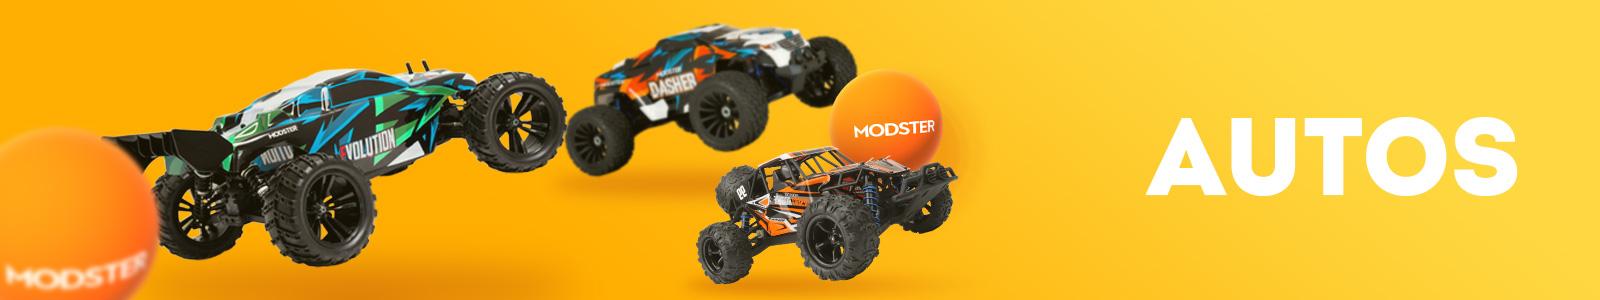 Modster-RC-Autos-Cars-RC-Radio-Control-Modellsport-Ferngesteuert